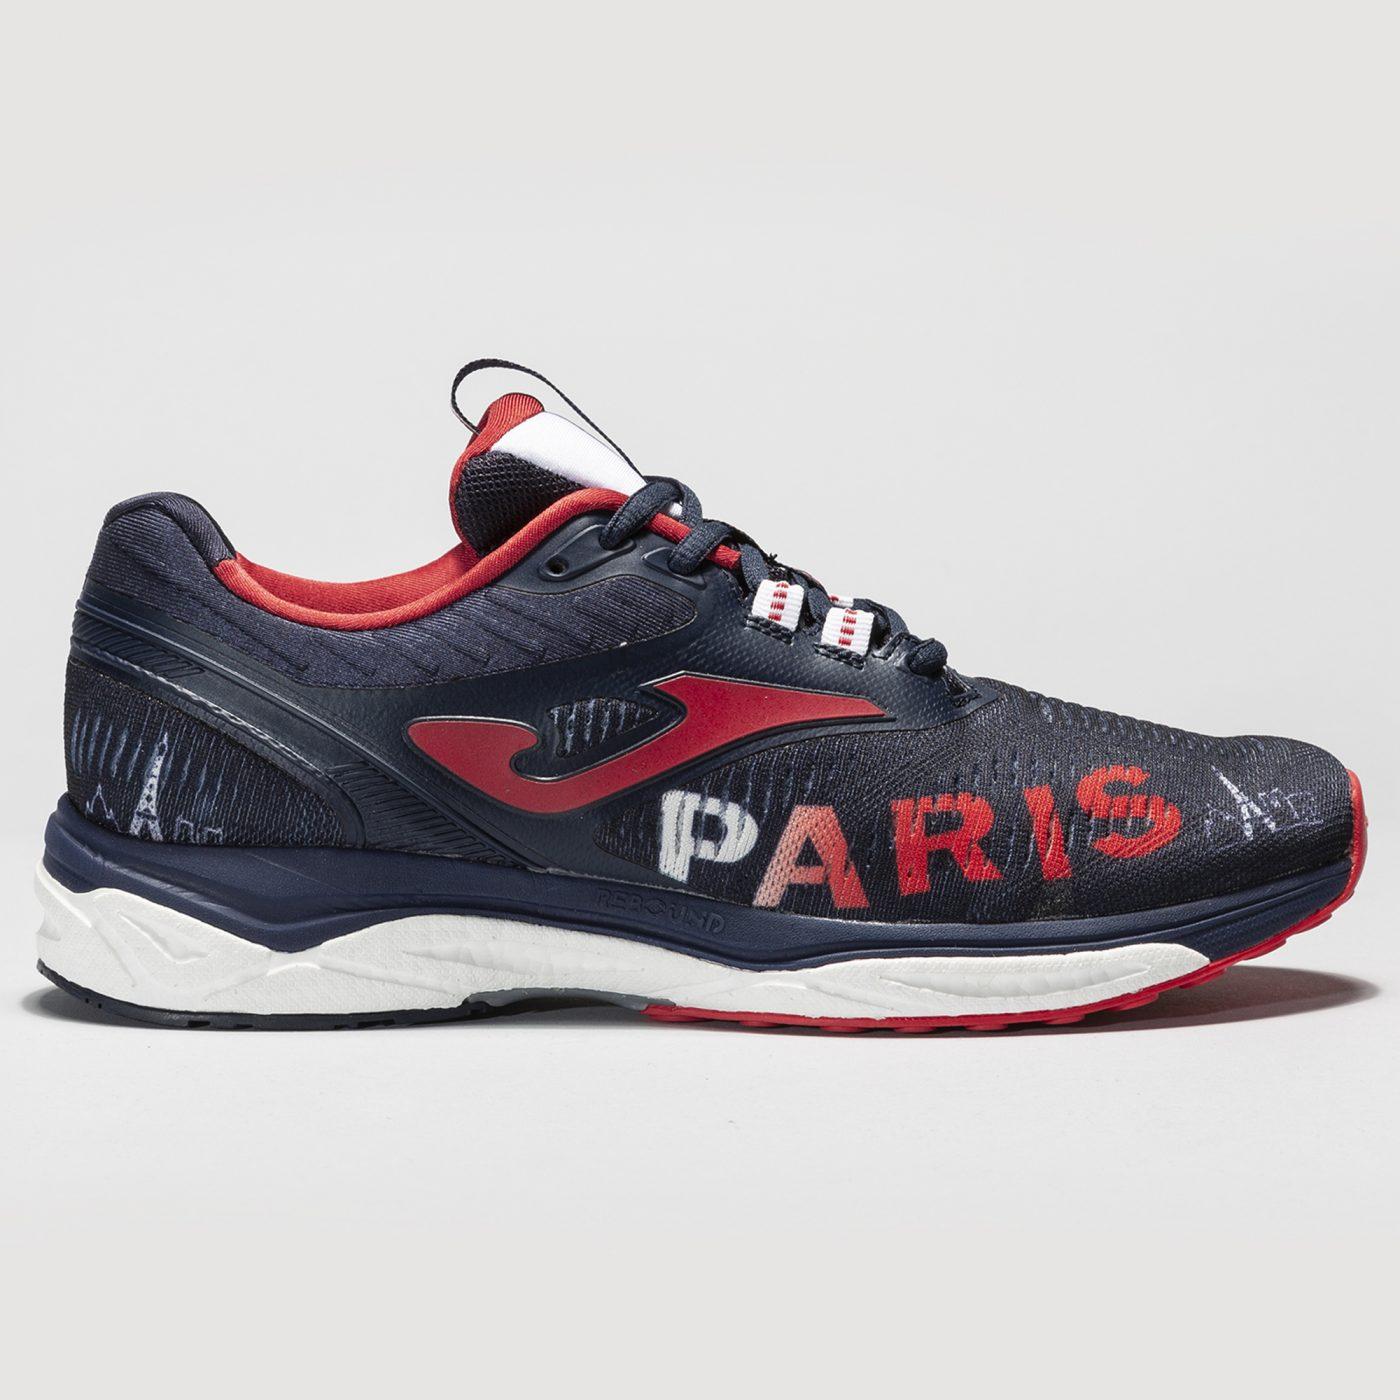 Supercross-Joma-Running-20km-de-paris-promo